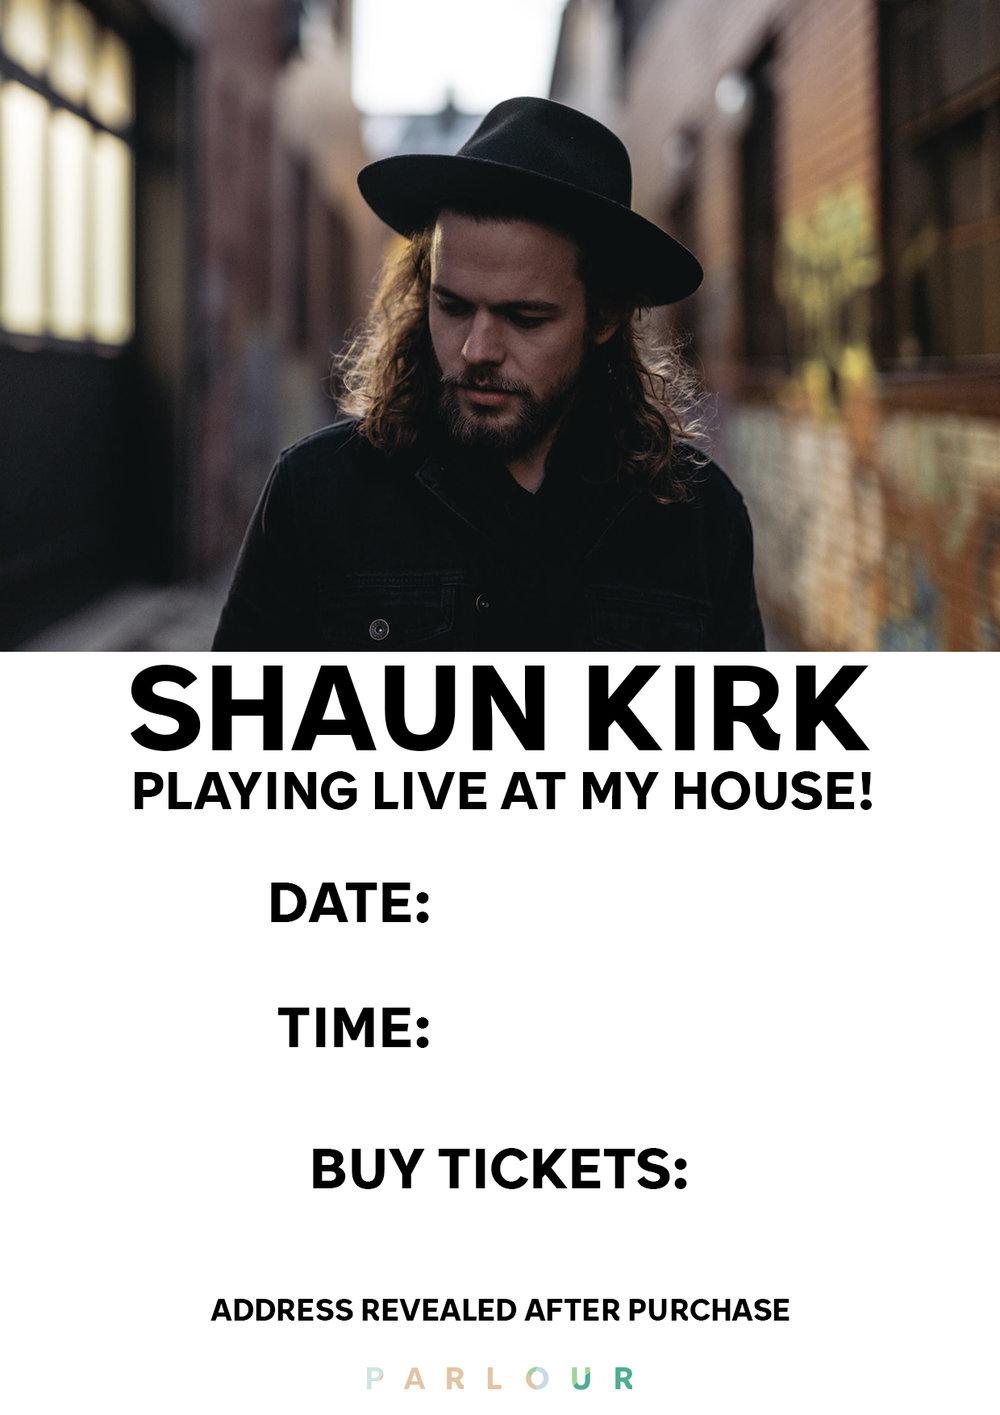 Shaun Kirk Poster.jpg